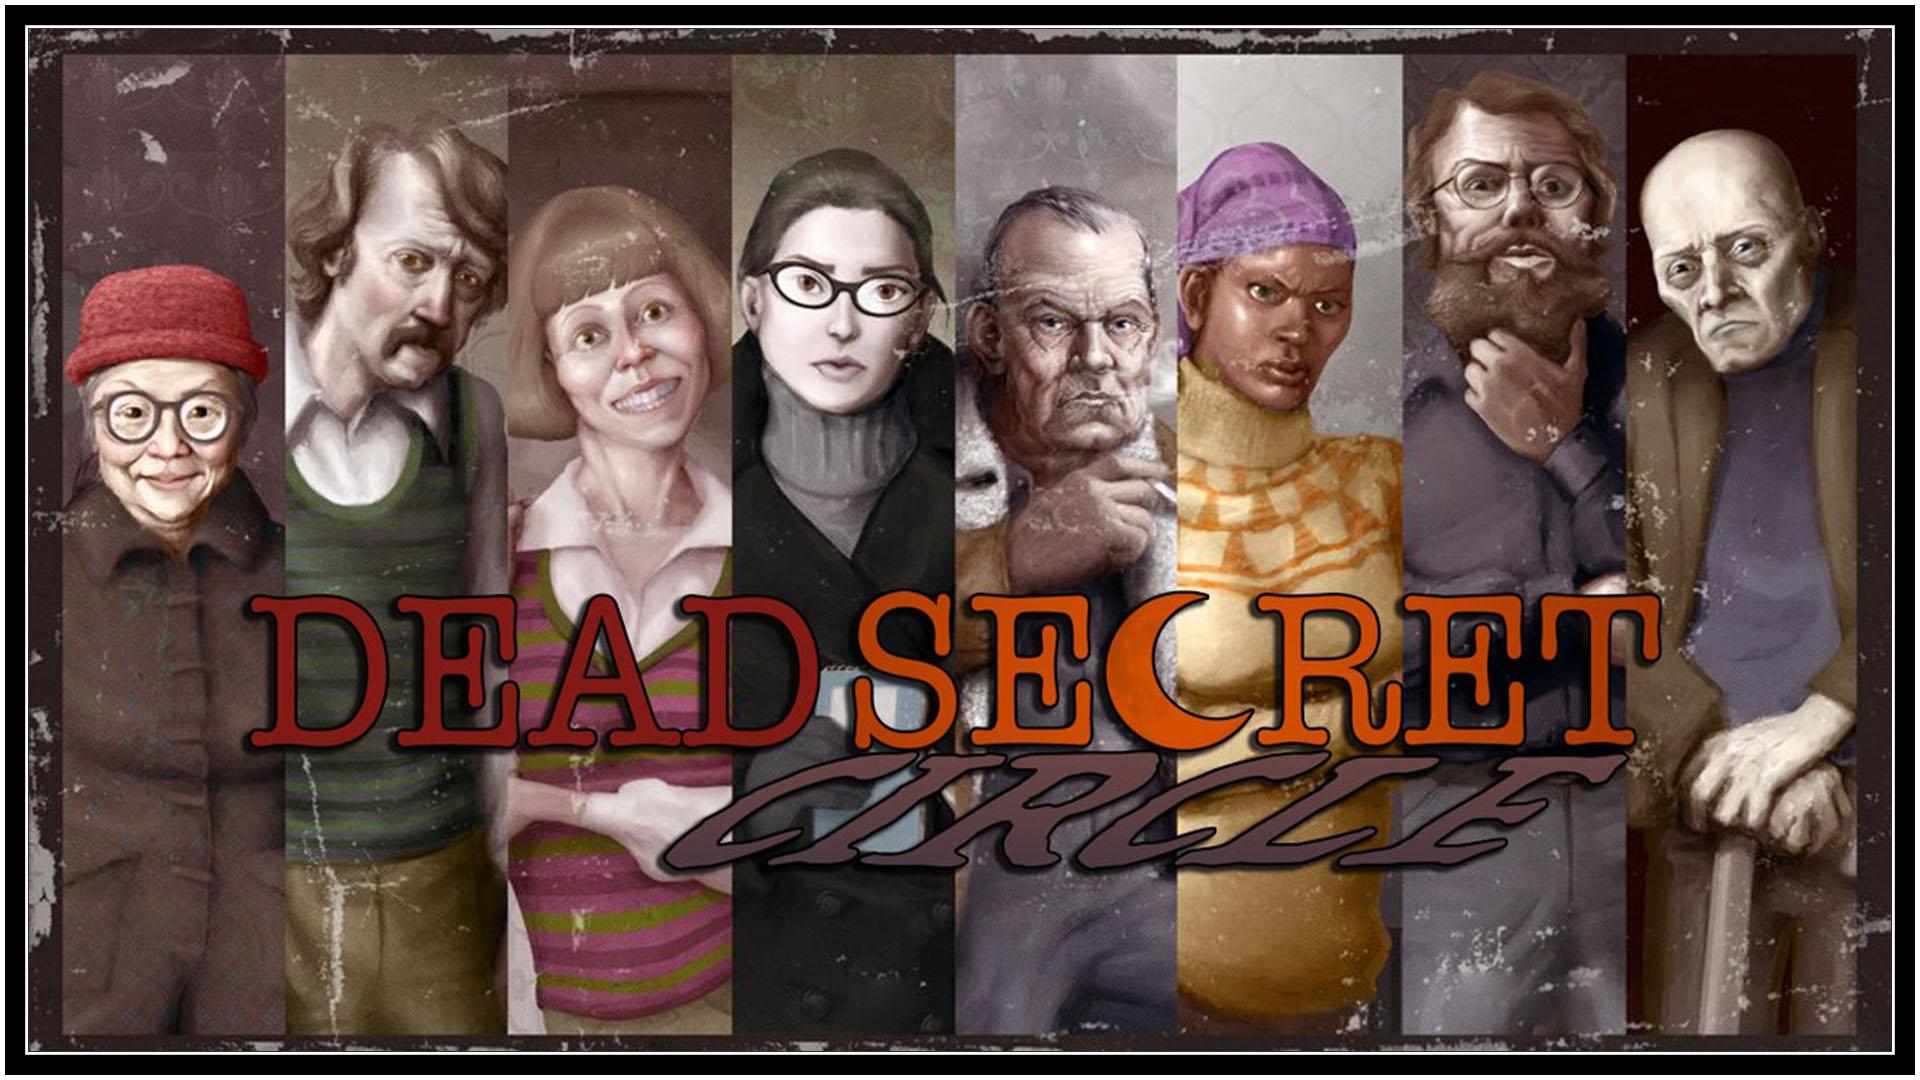 Dead Secret Circle Fi3